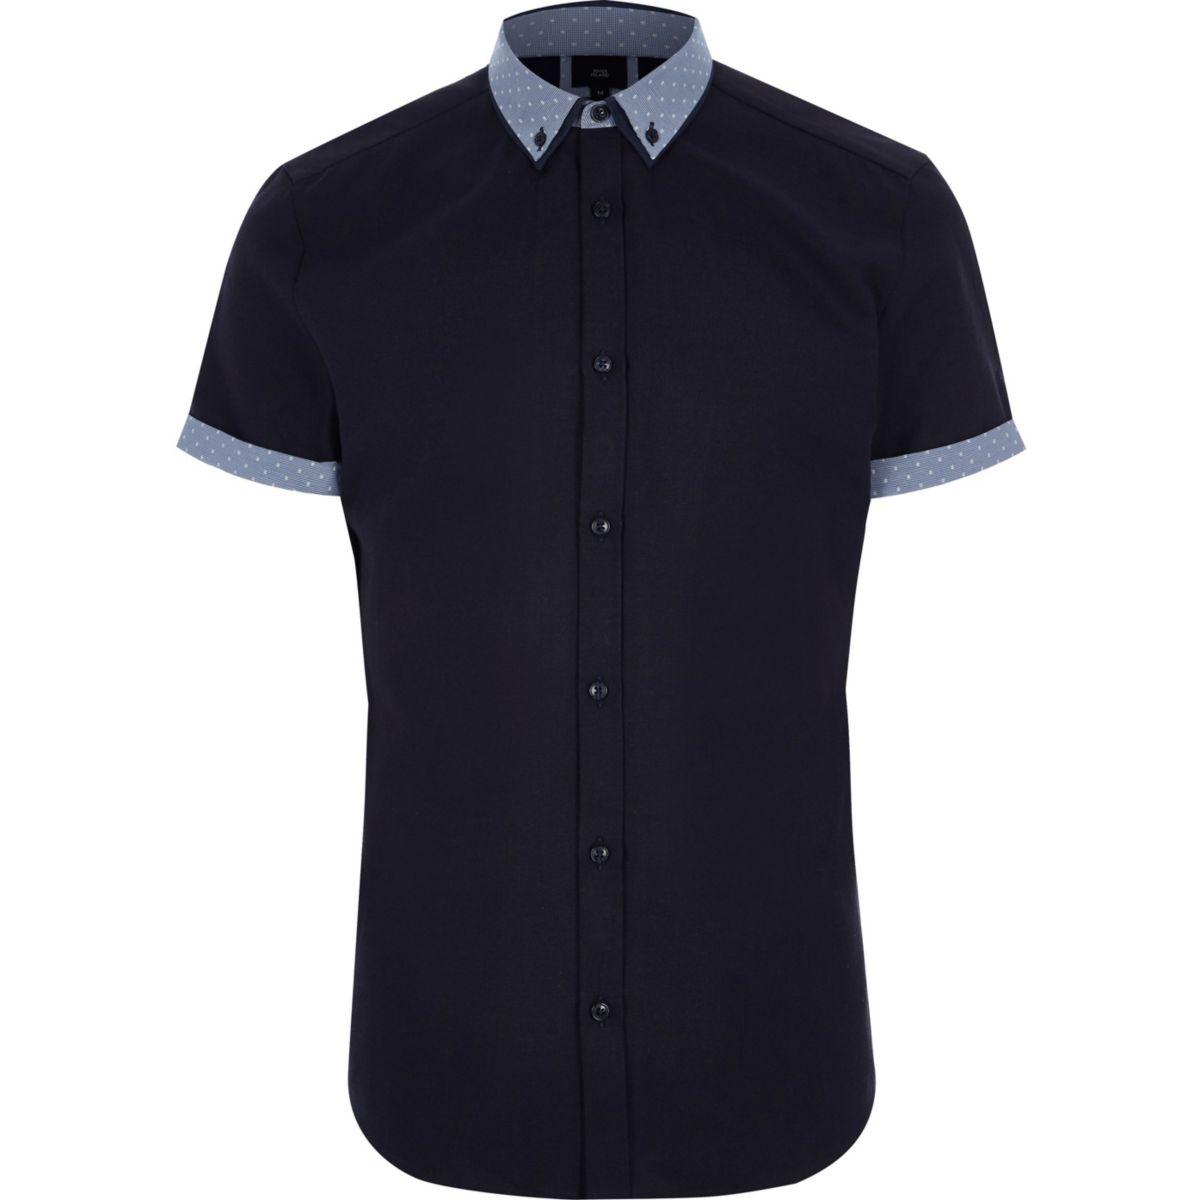 Big and Tall navy polka dot collar shirt